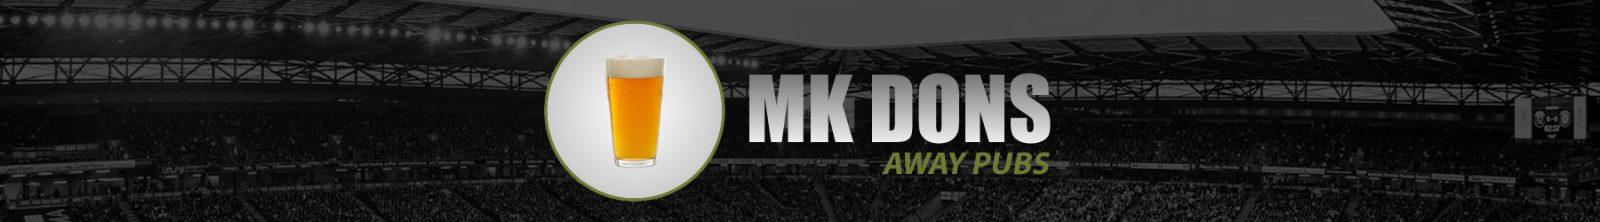 MK Dons Away Pubs